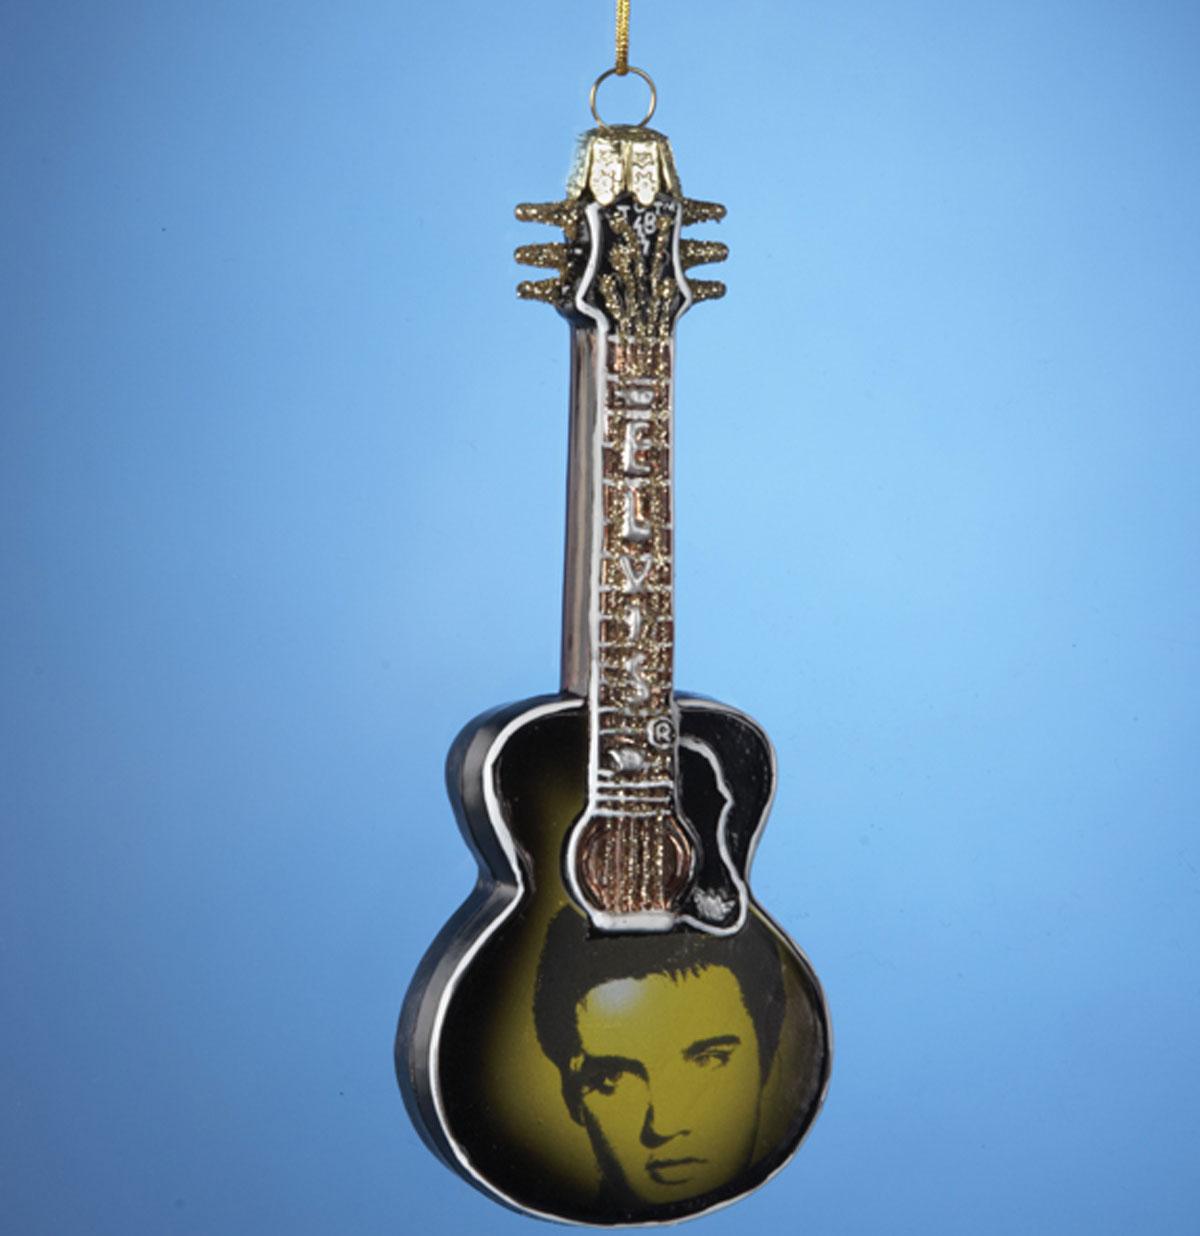 Elvis Presley Gitaar met afbeelding Kerst Hanger Glas